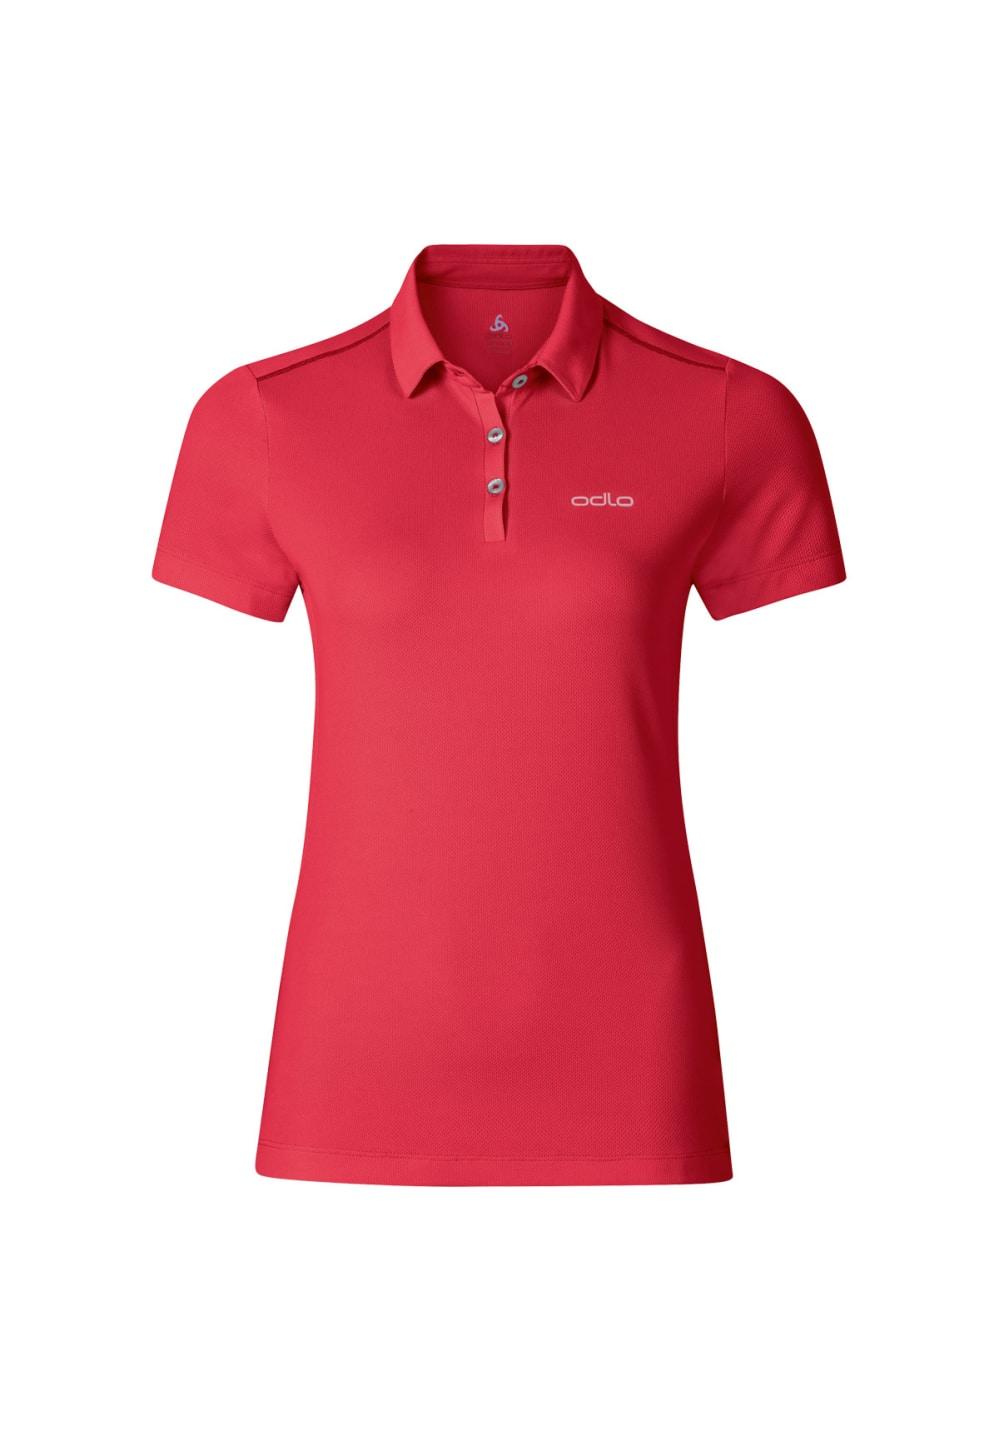 10b0de8614c768 Odlo Polo Shirt Short Sleeve Tina - Laufshirts für Damen - Rot